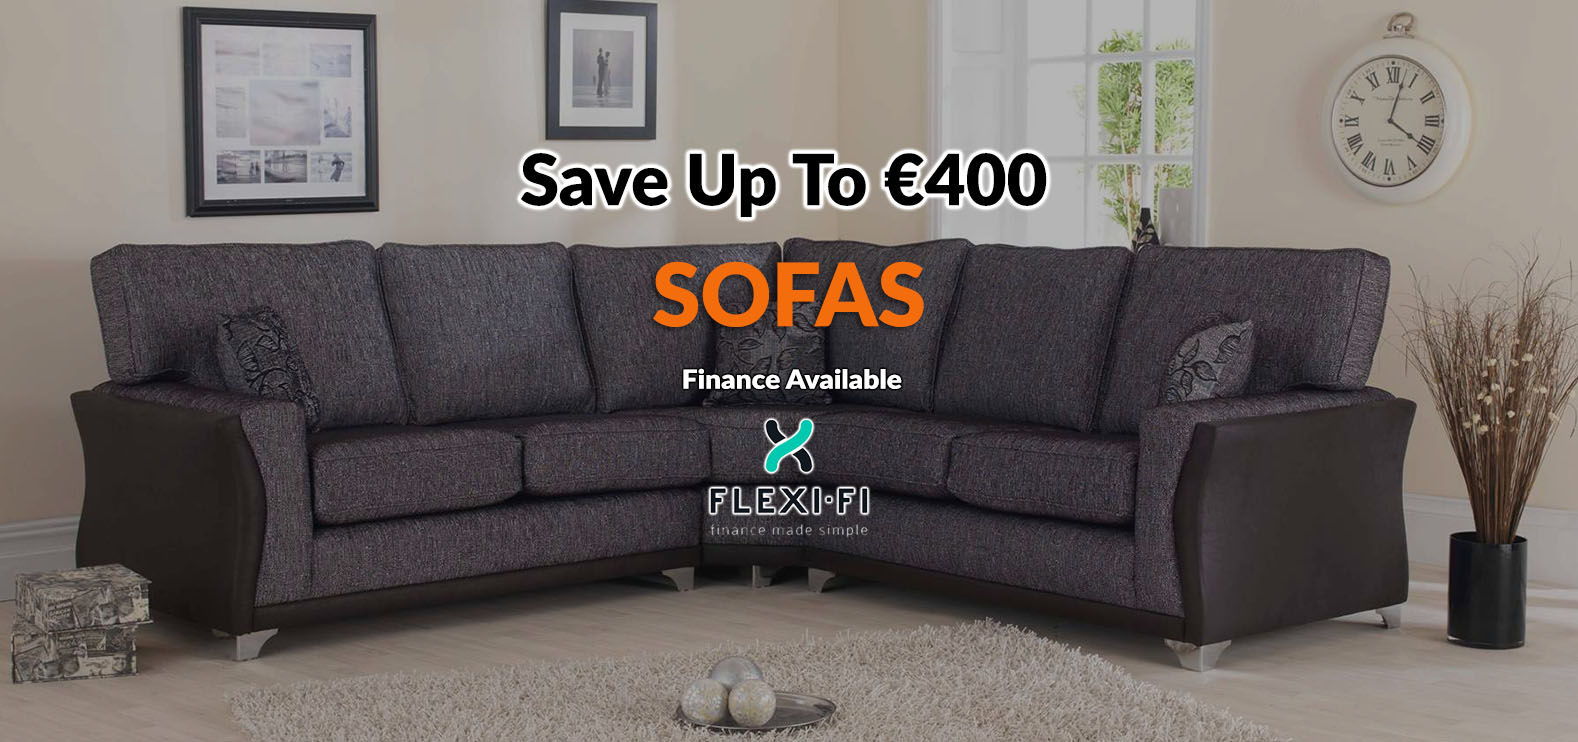 sofas-new-1